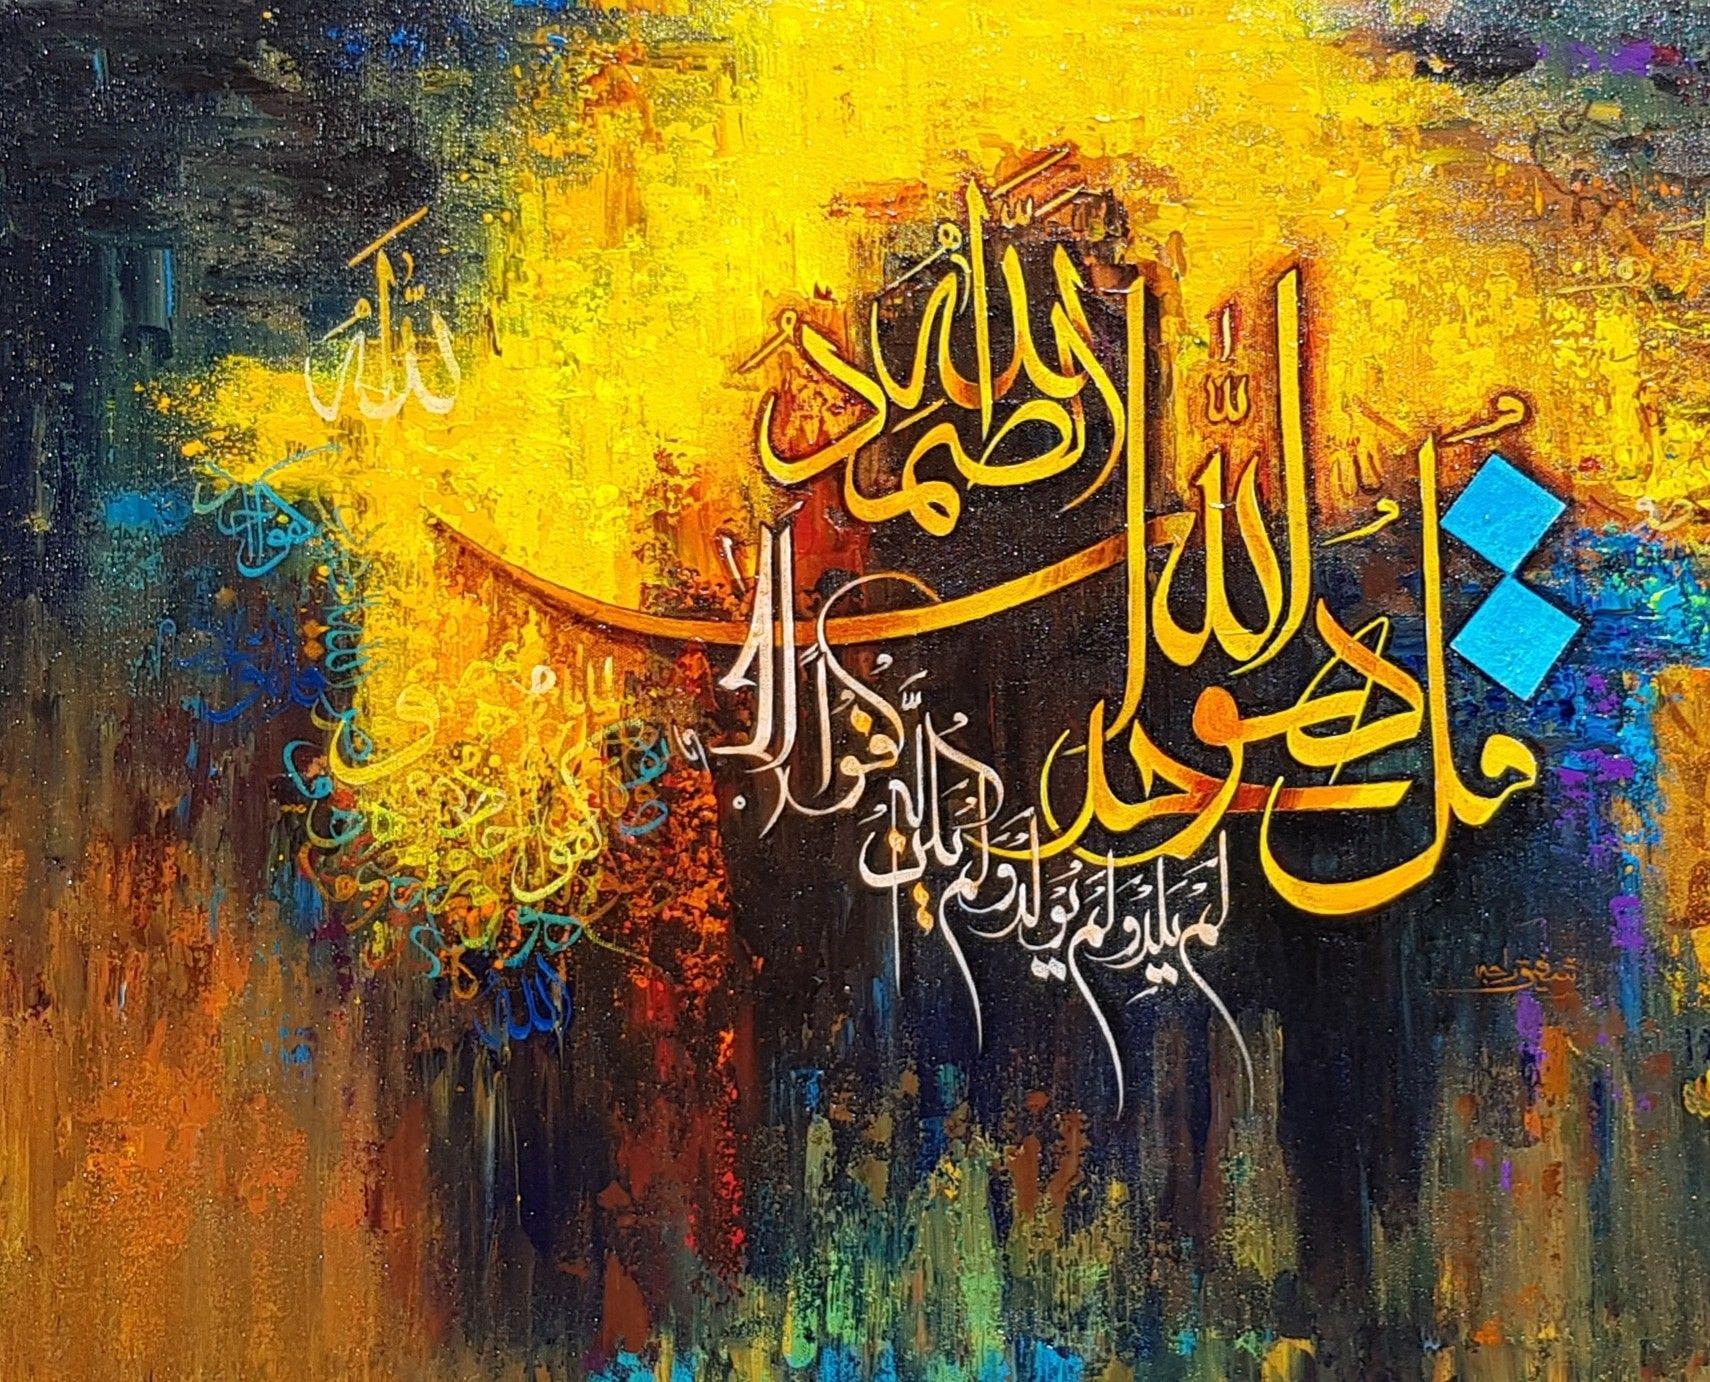 Pin By Nadiya Malik On Islamic Calligraphy Islamic Art Calligraphy Islamic Calligraphy Painting Islamic Caligraphy Art